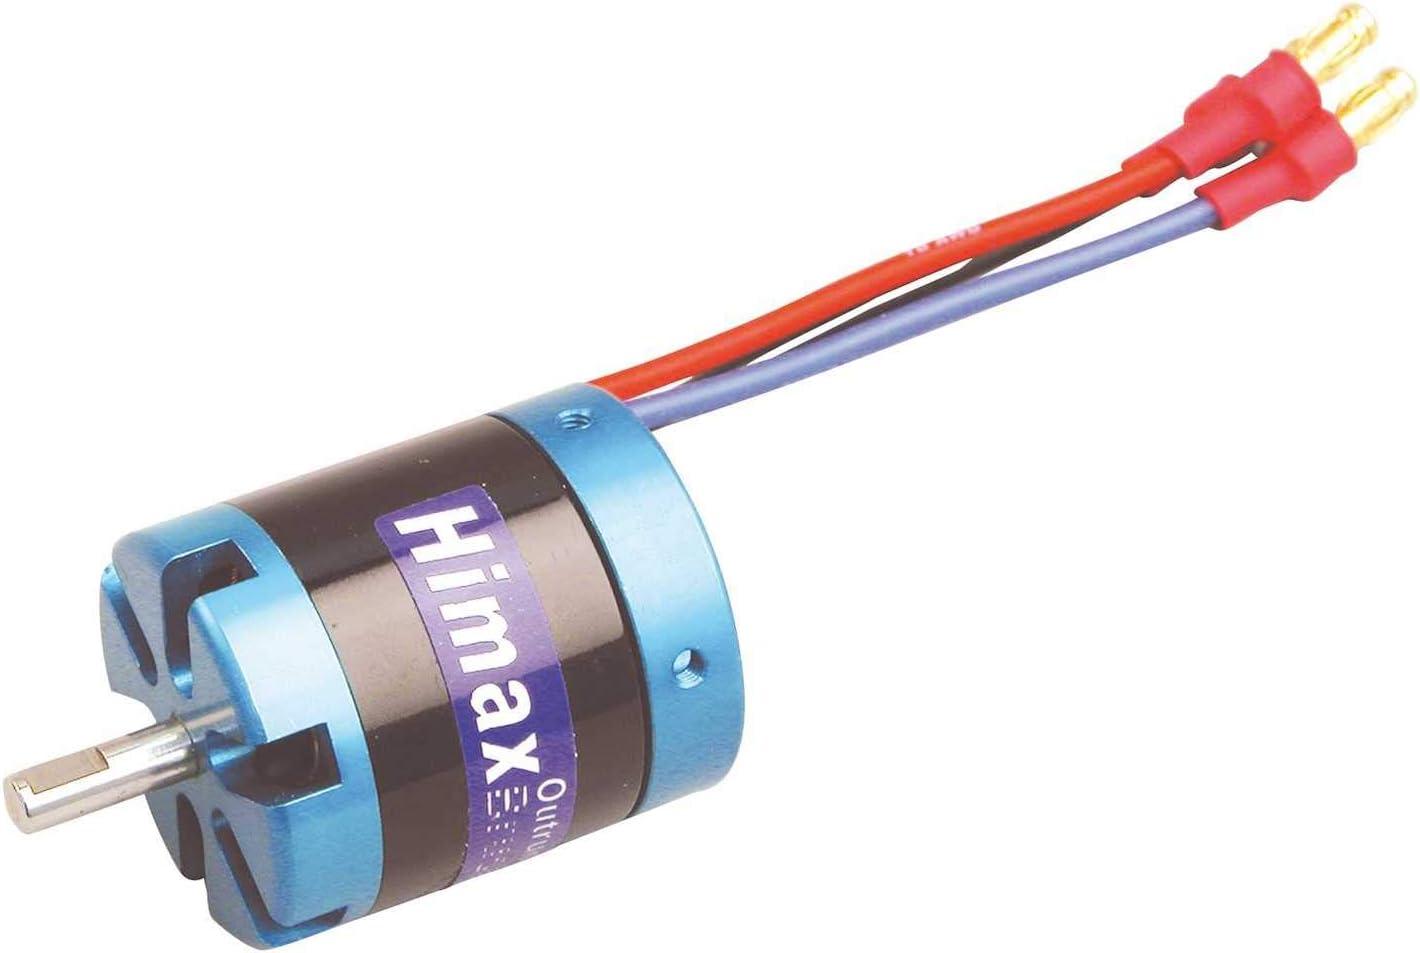 Multiplex Aussenl/äufer E-Motor Himax C 2816-1220 m Zubeh/ör 333017